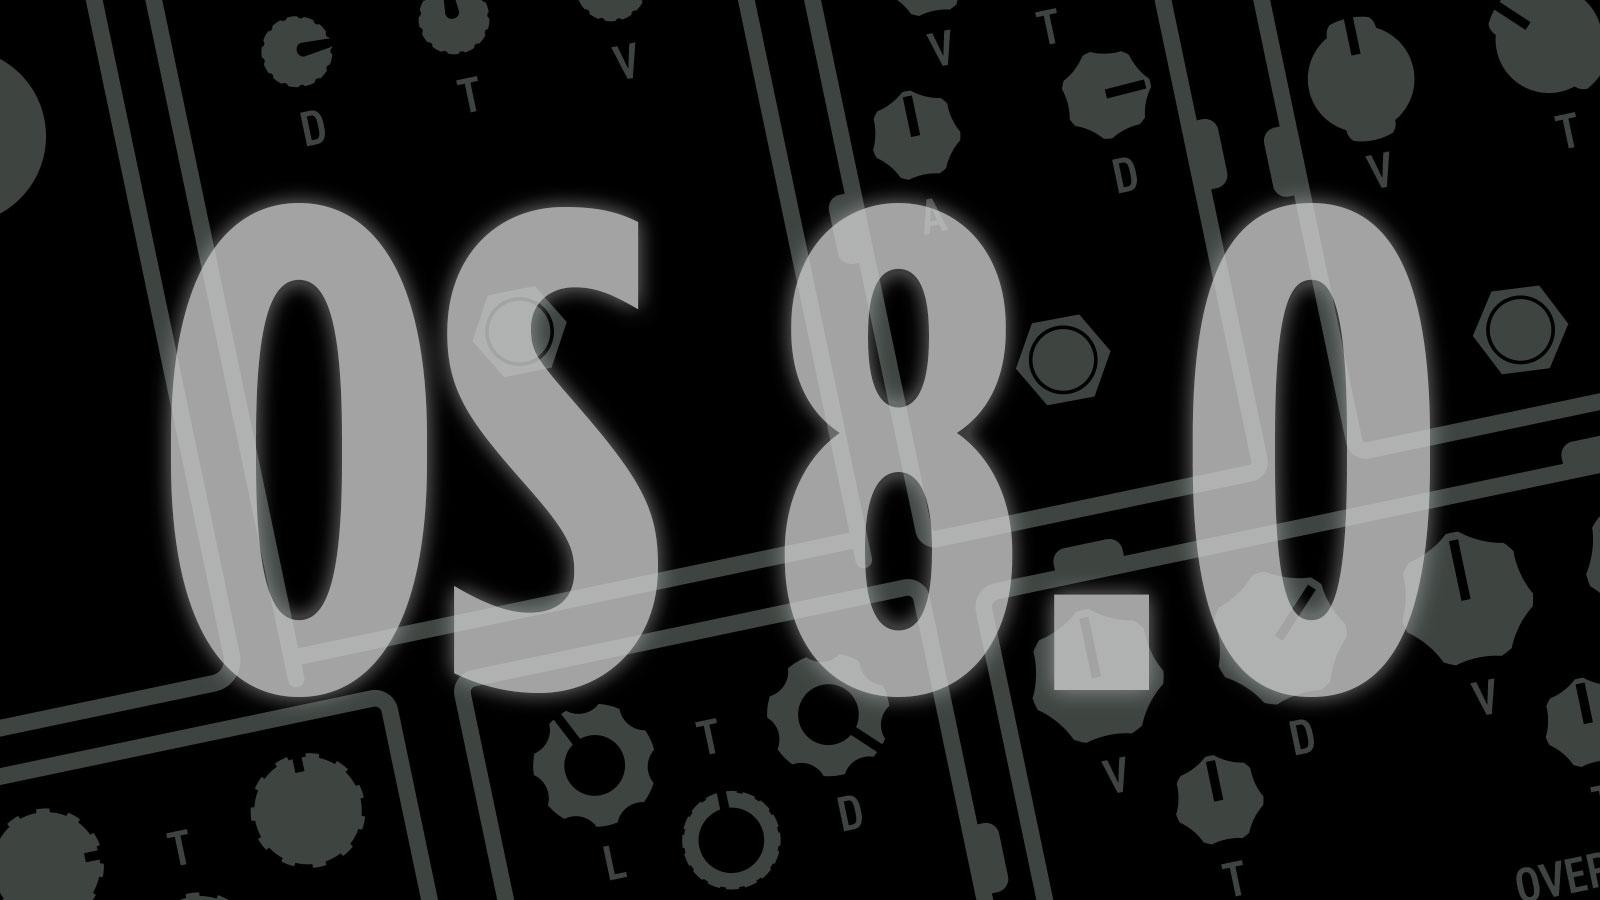 kemper 0s8 strumenti musicali